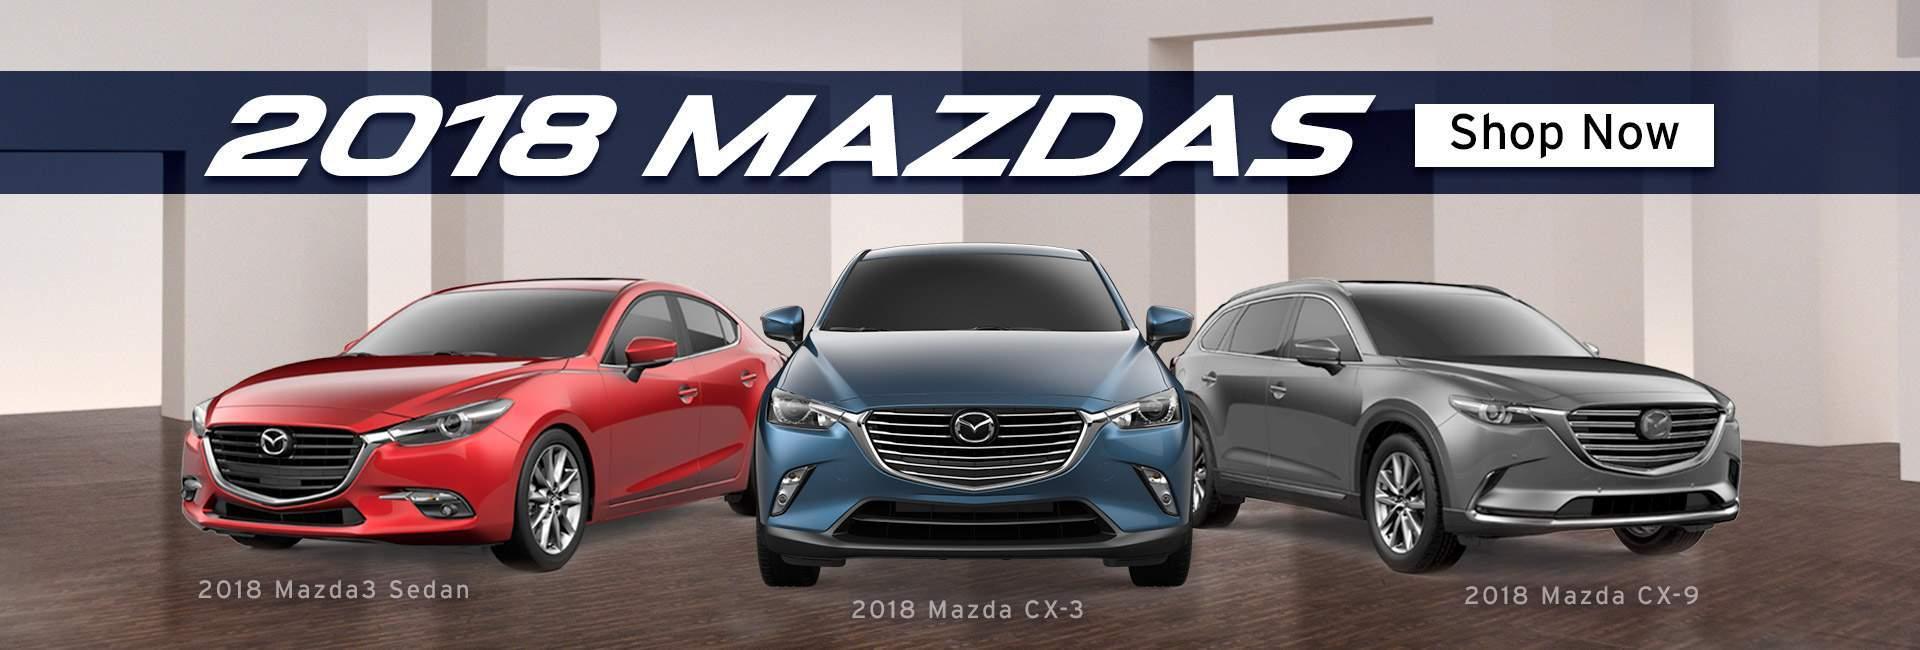 Used Cars Dealerships In Savannah Ga >> Mazda Dealership Savannah Ga Used Cars Fairway Mazda